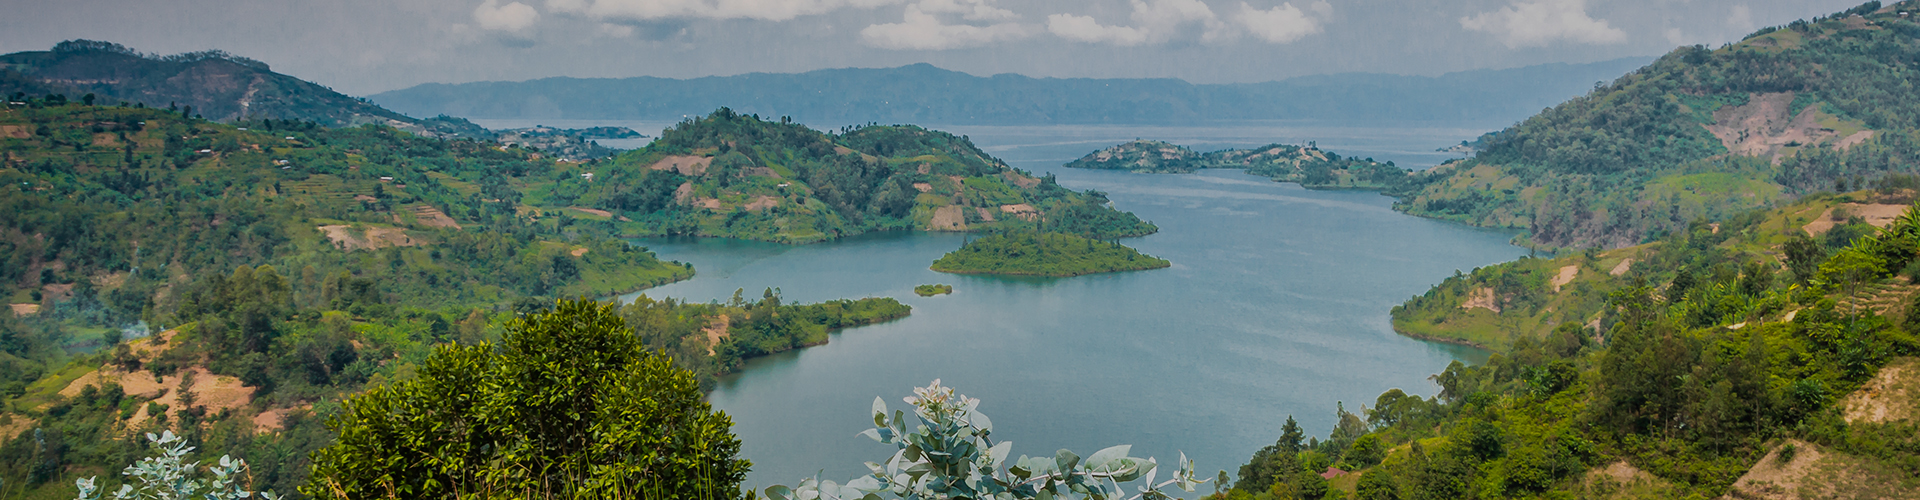 Landmark photograph of Rwanda